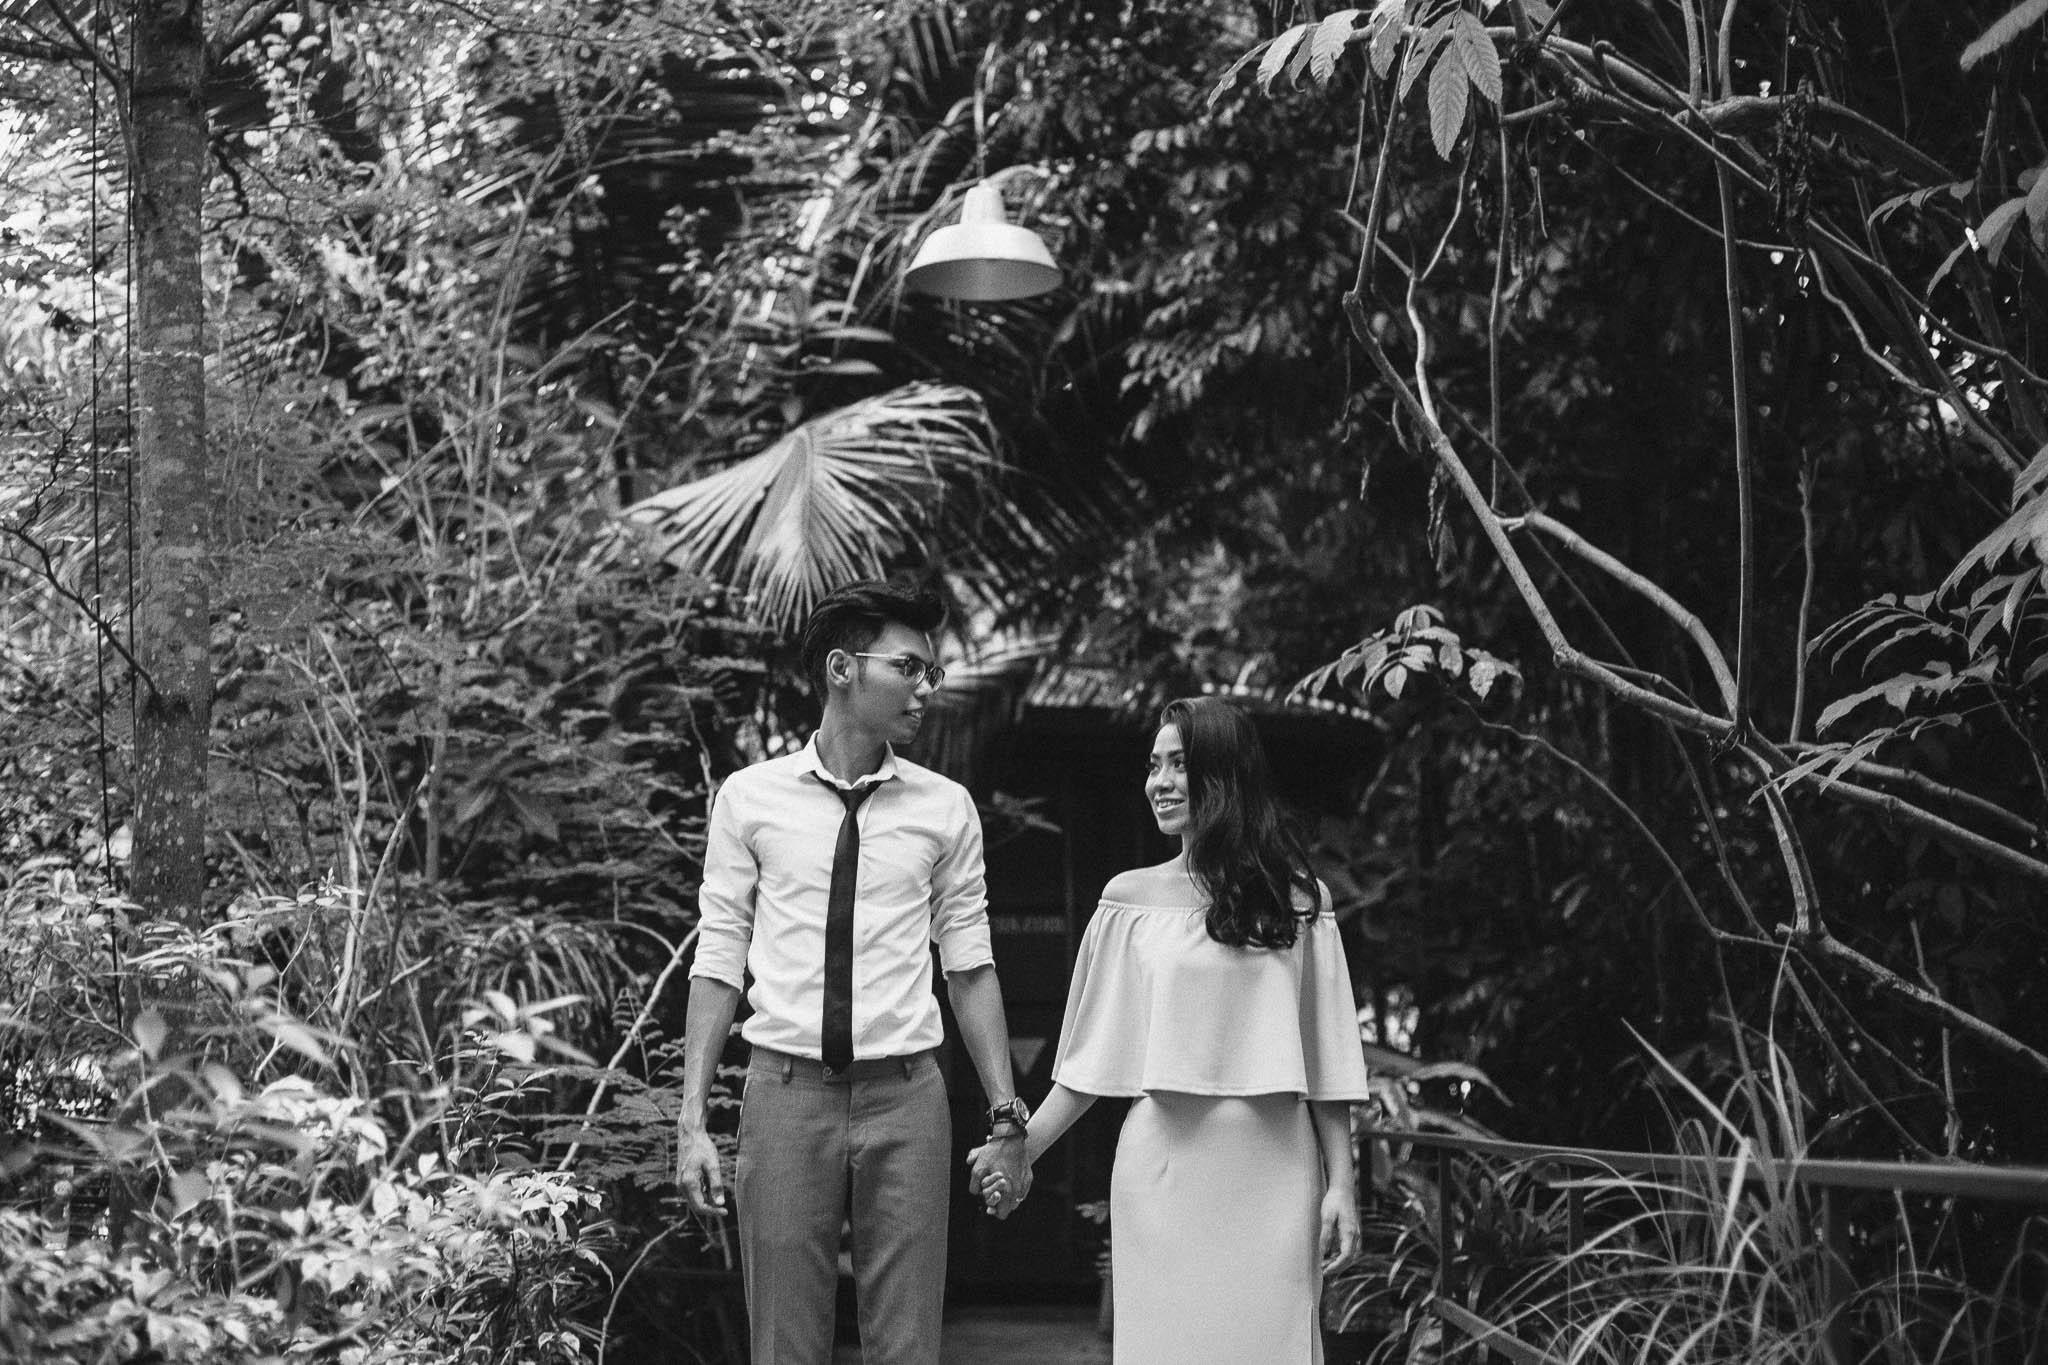 singapore-wedding-photographer-malay-travel-adli-tashah-41.jpg